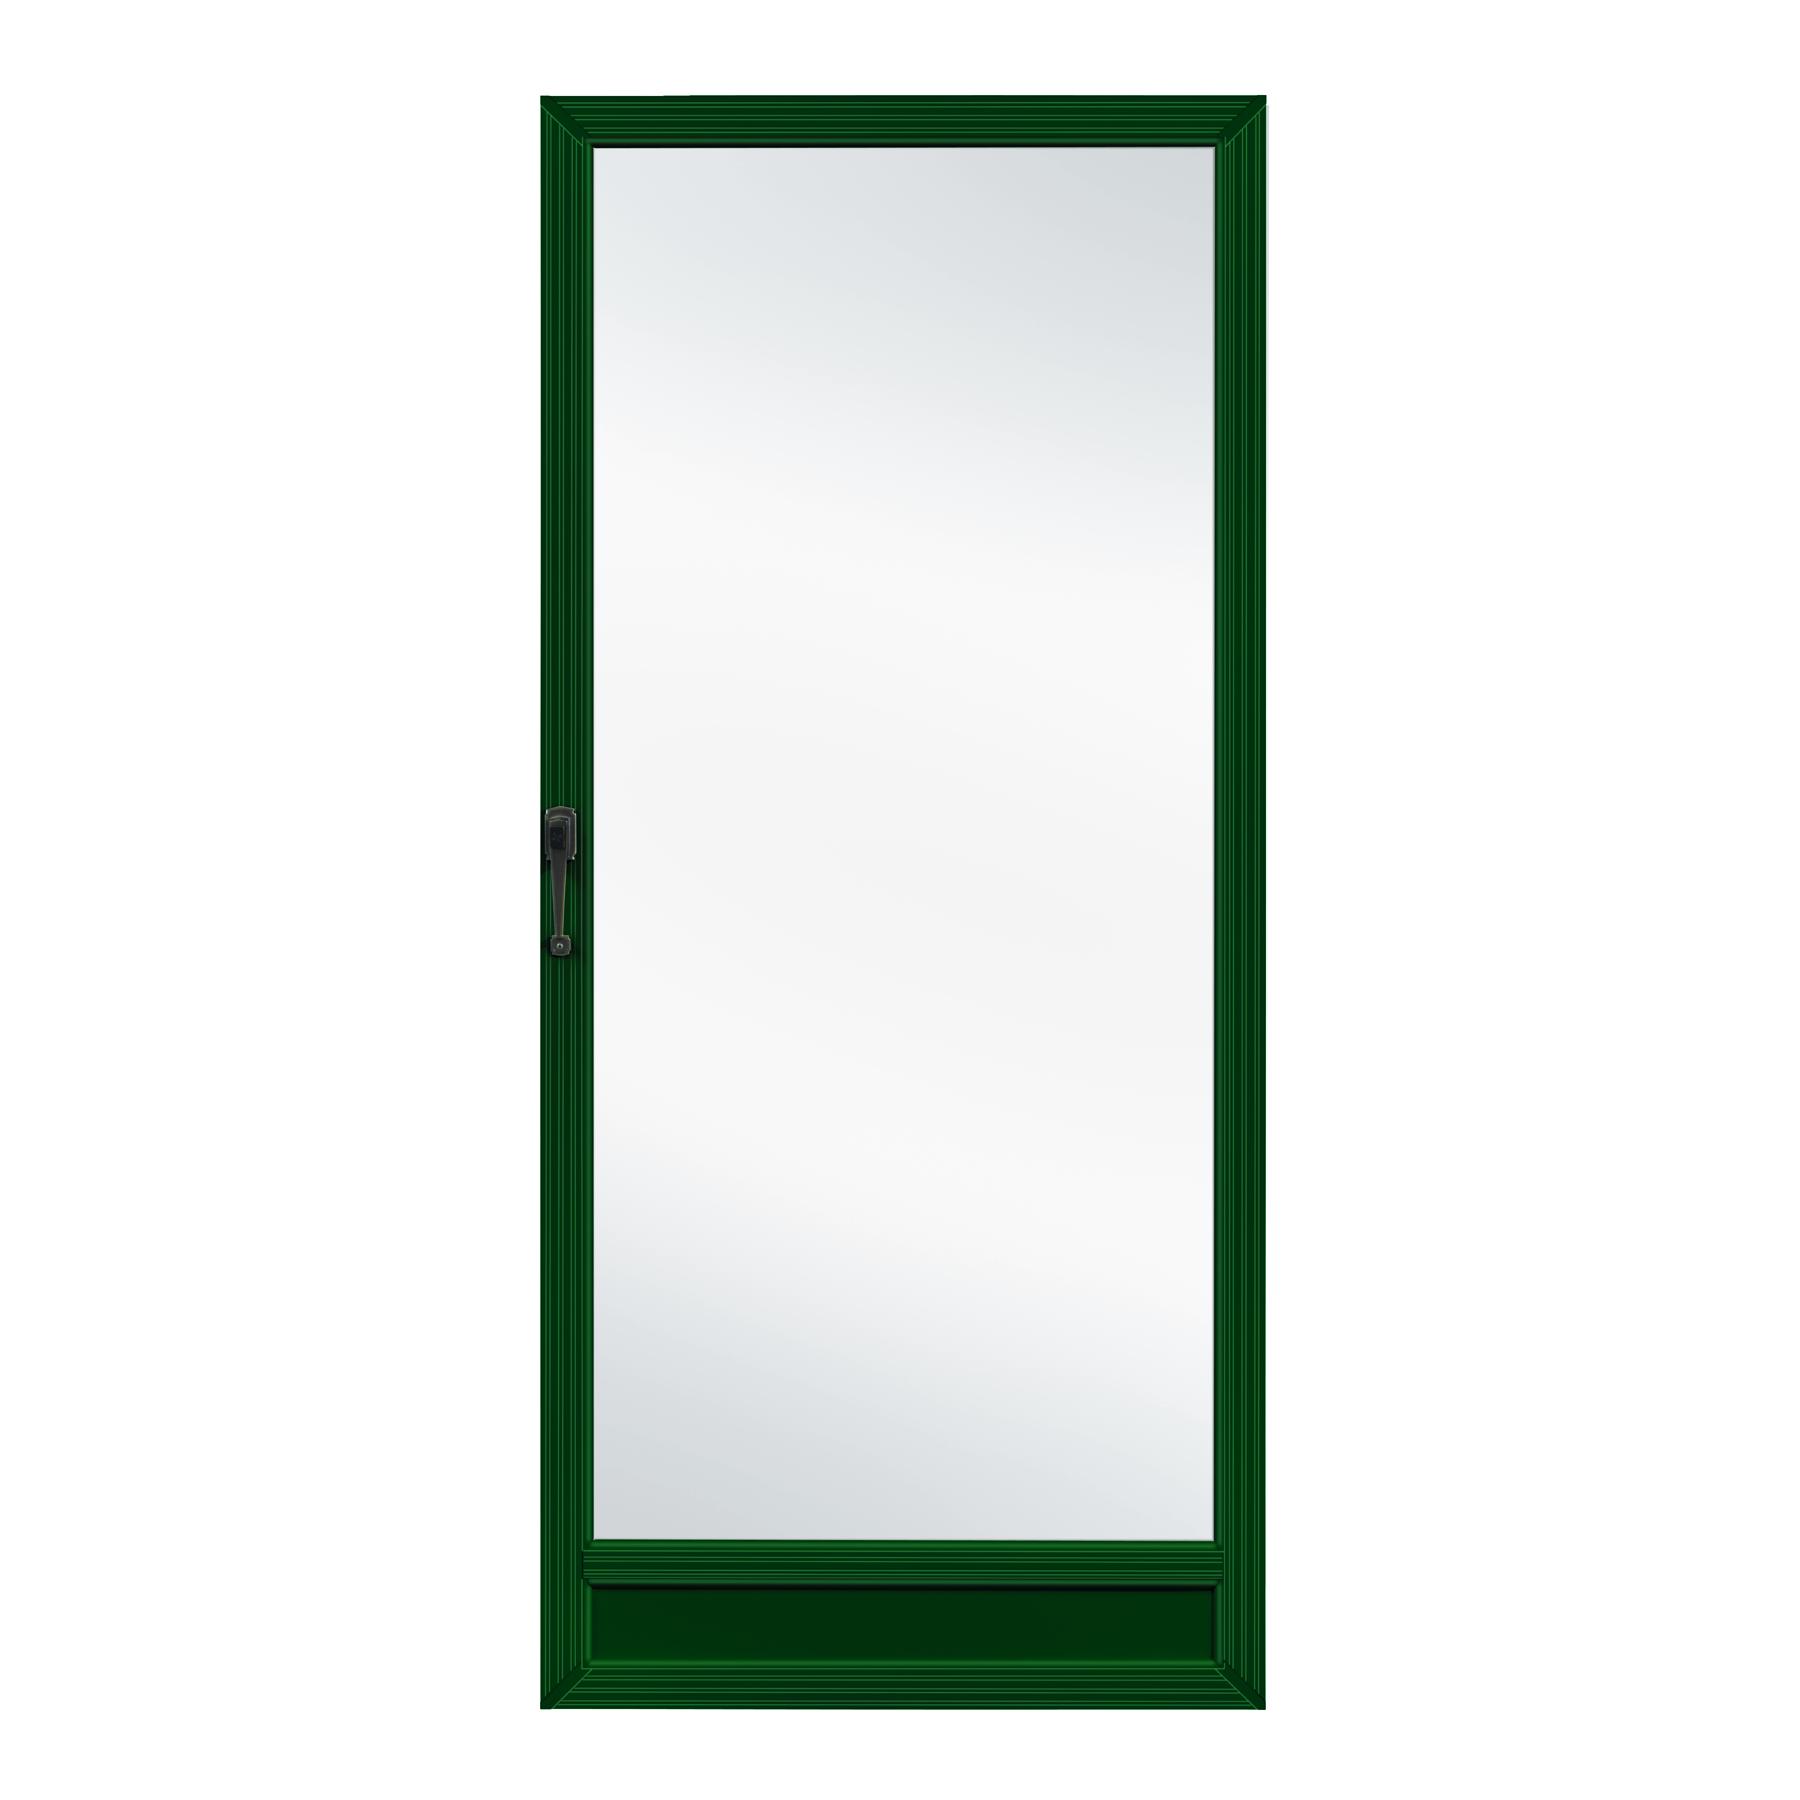 STORM DOORS. Sub Categories. CLASSIC STANDARD SIZES